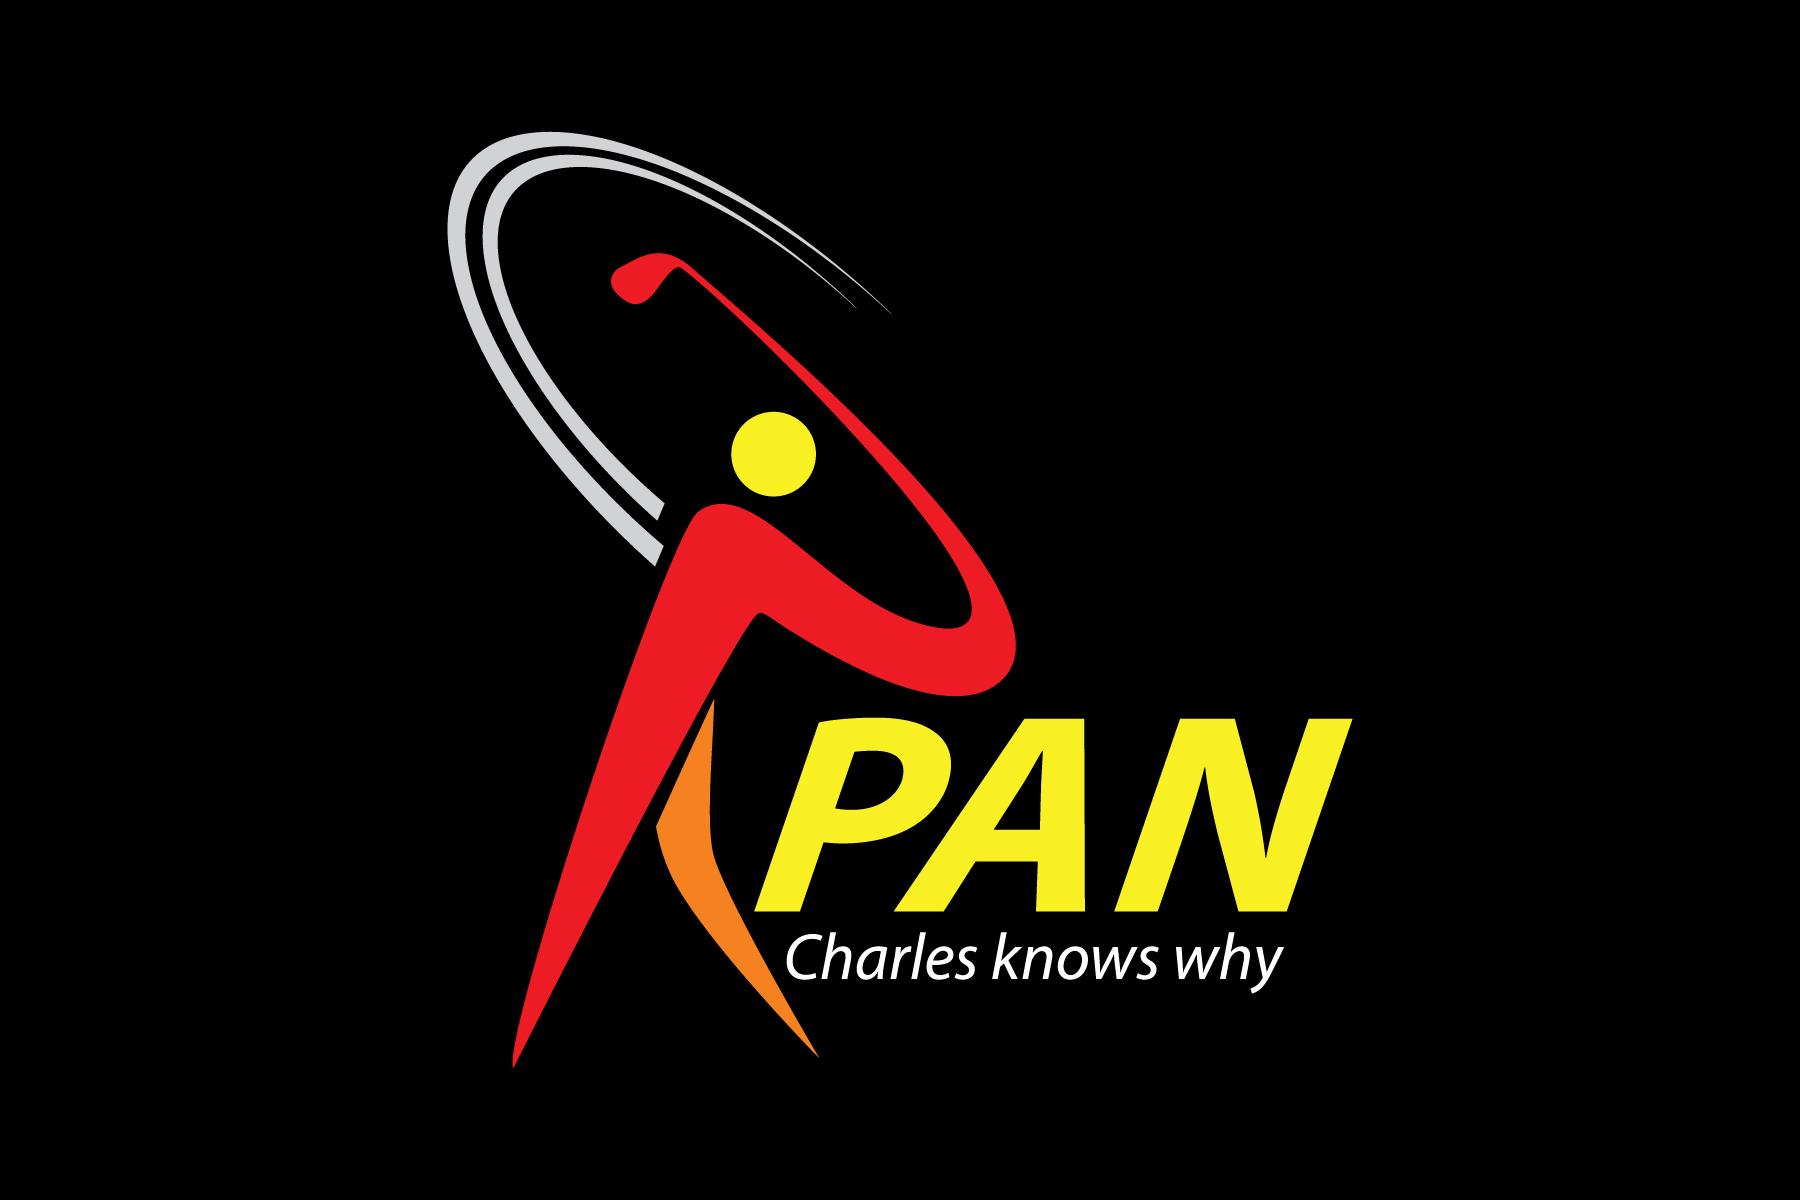 Charles Pan